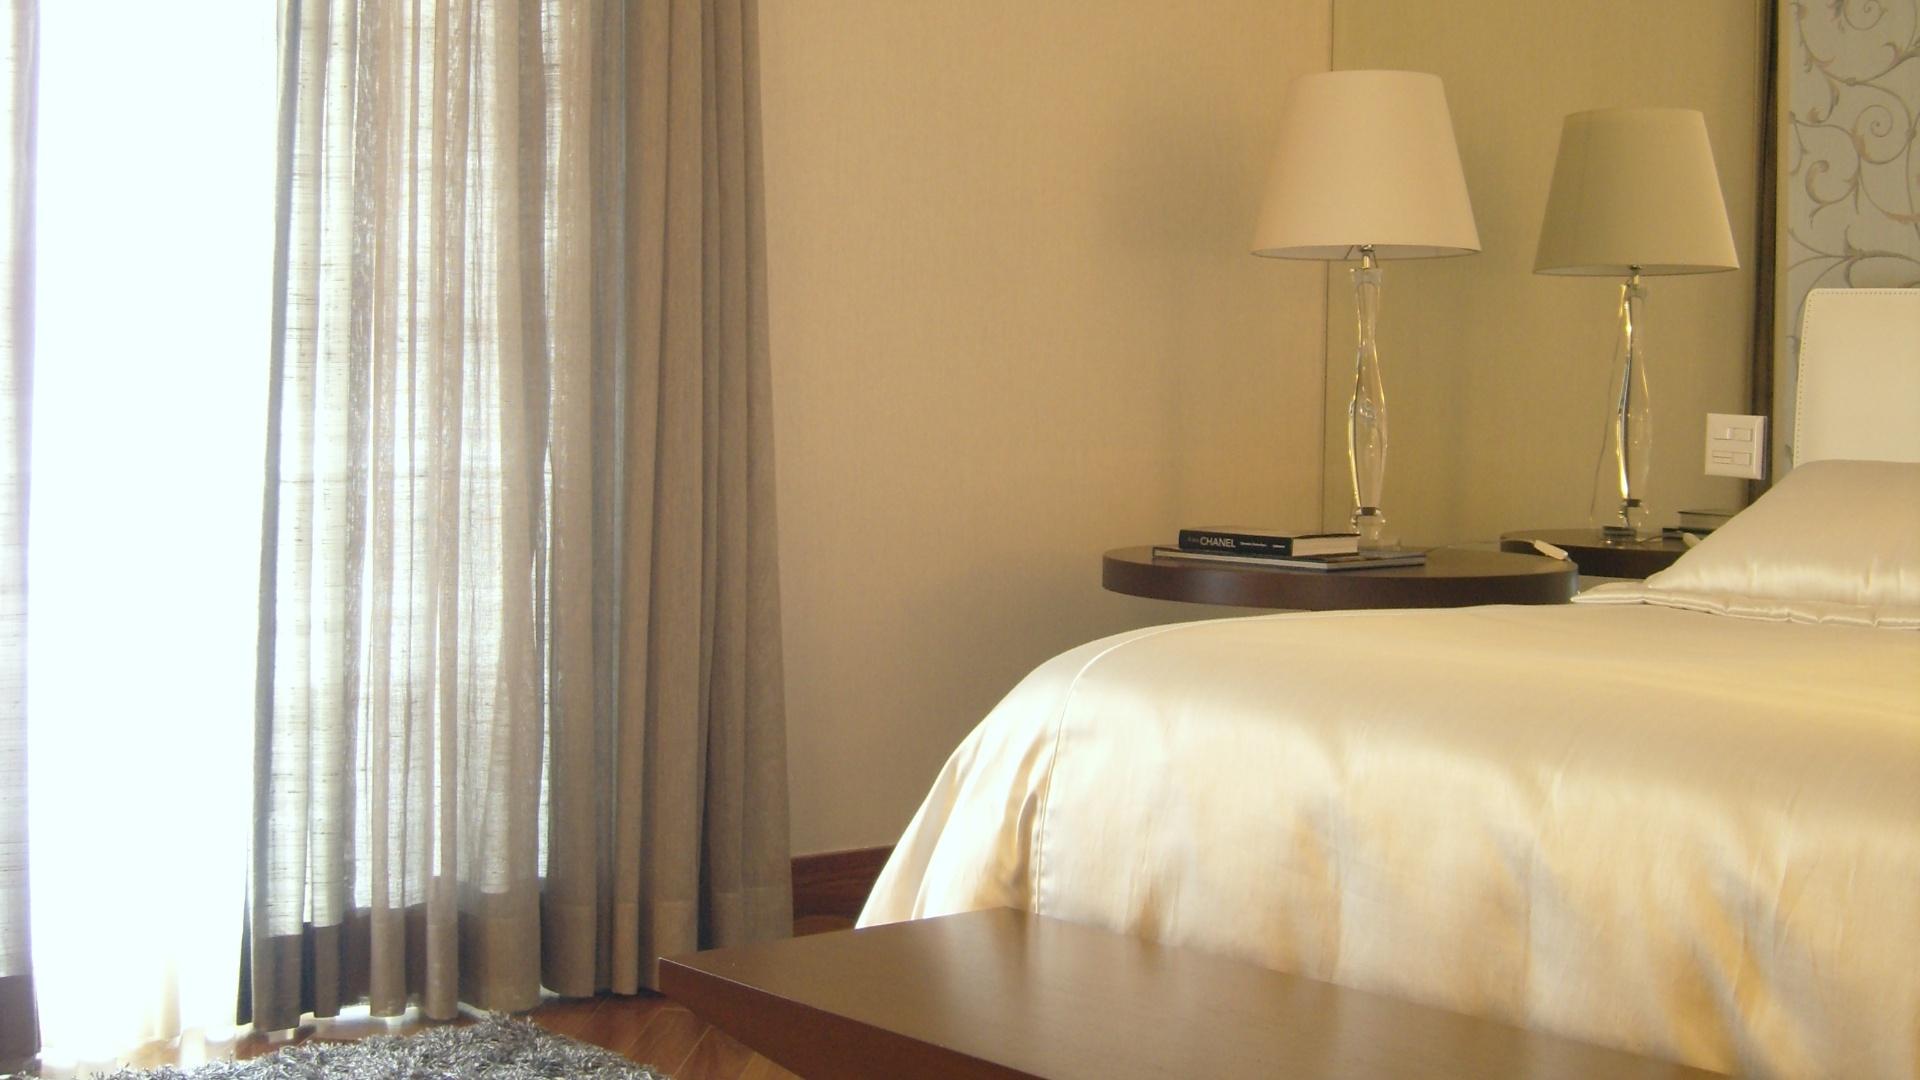 Fotos conhe a os diferentes tipos de cortinas e persianas - Cortinas tipo persianas ...